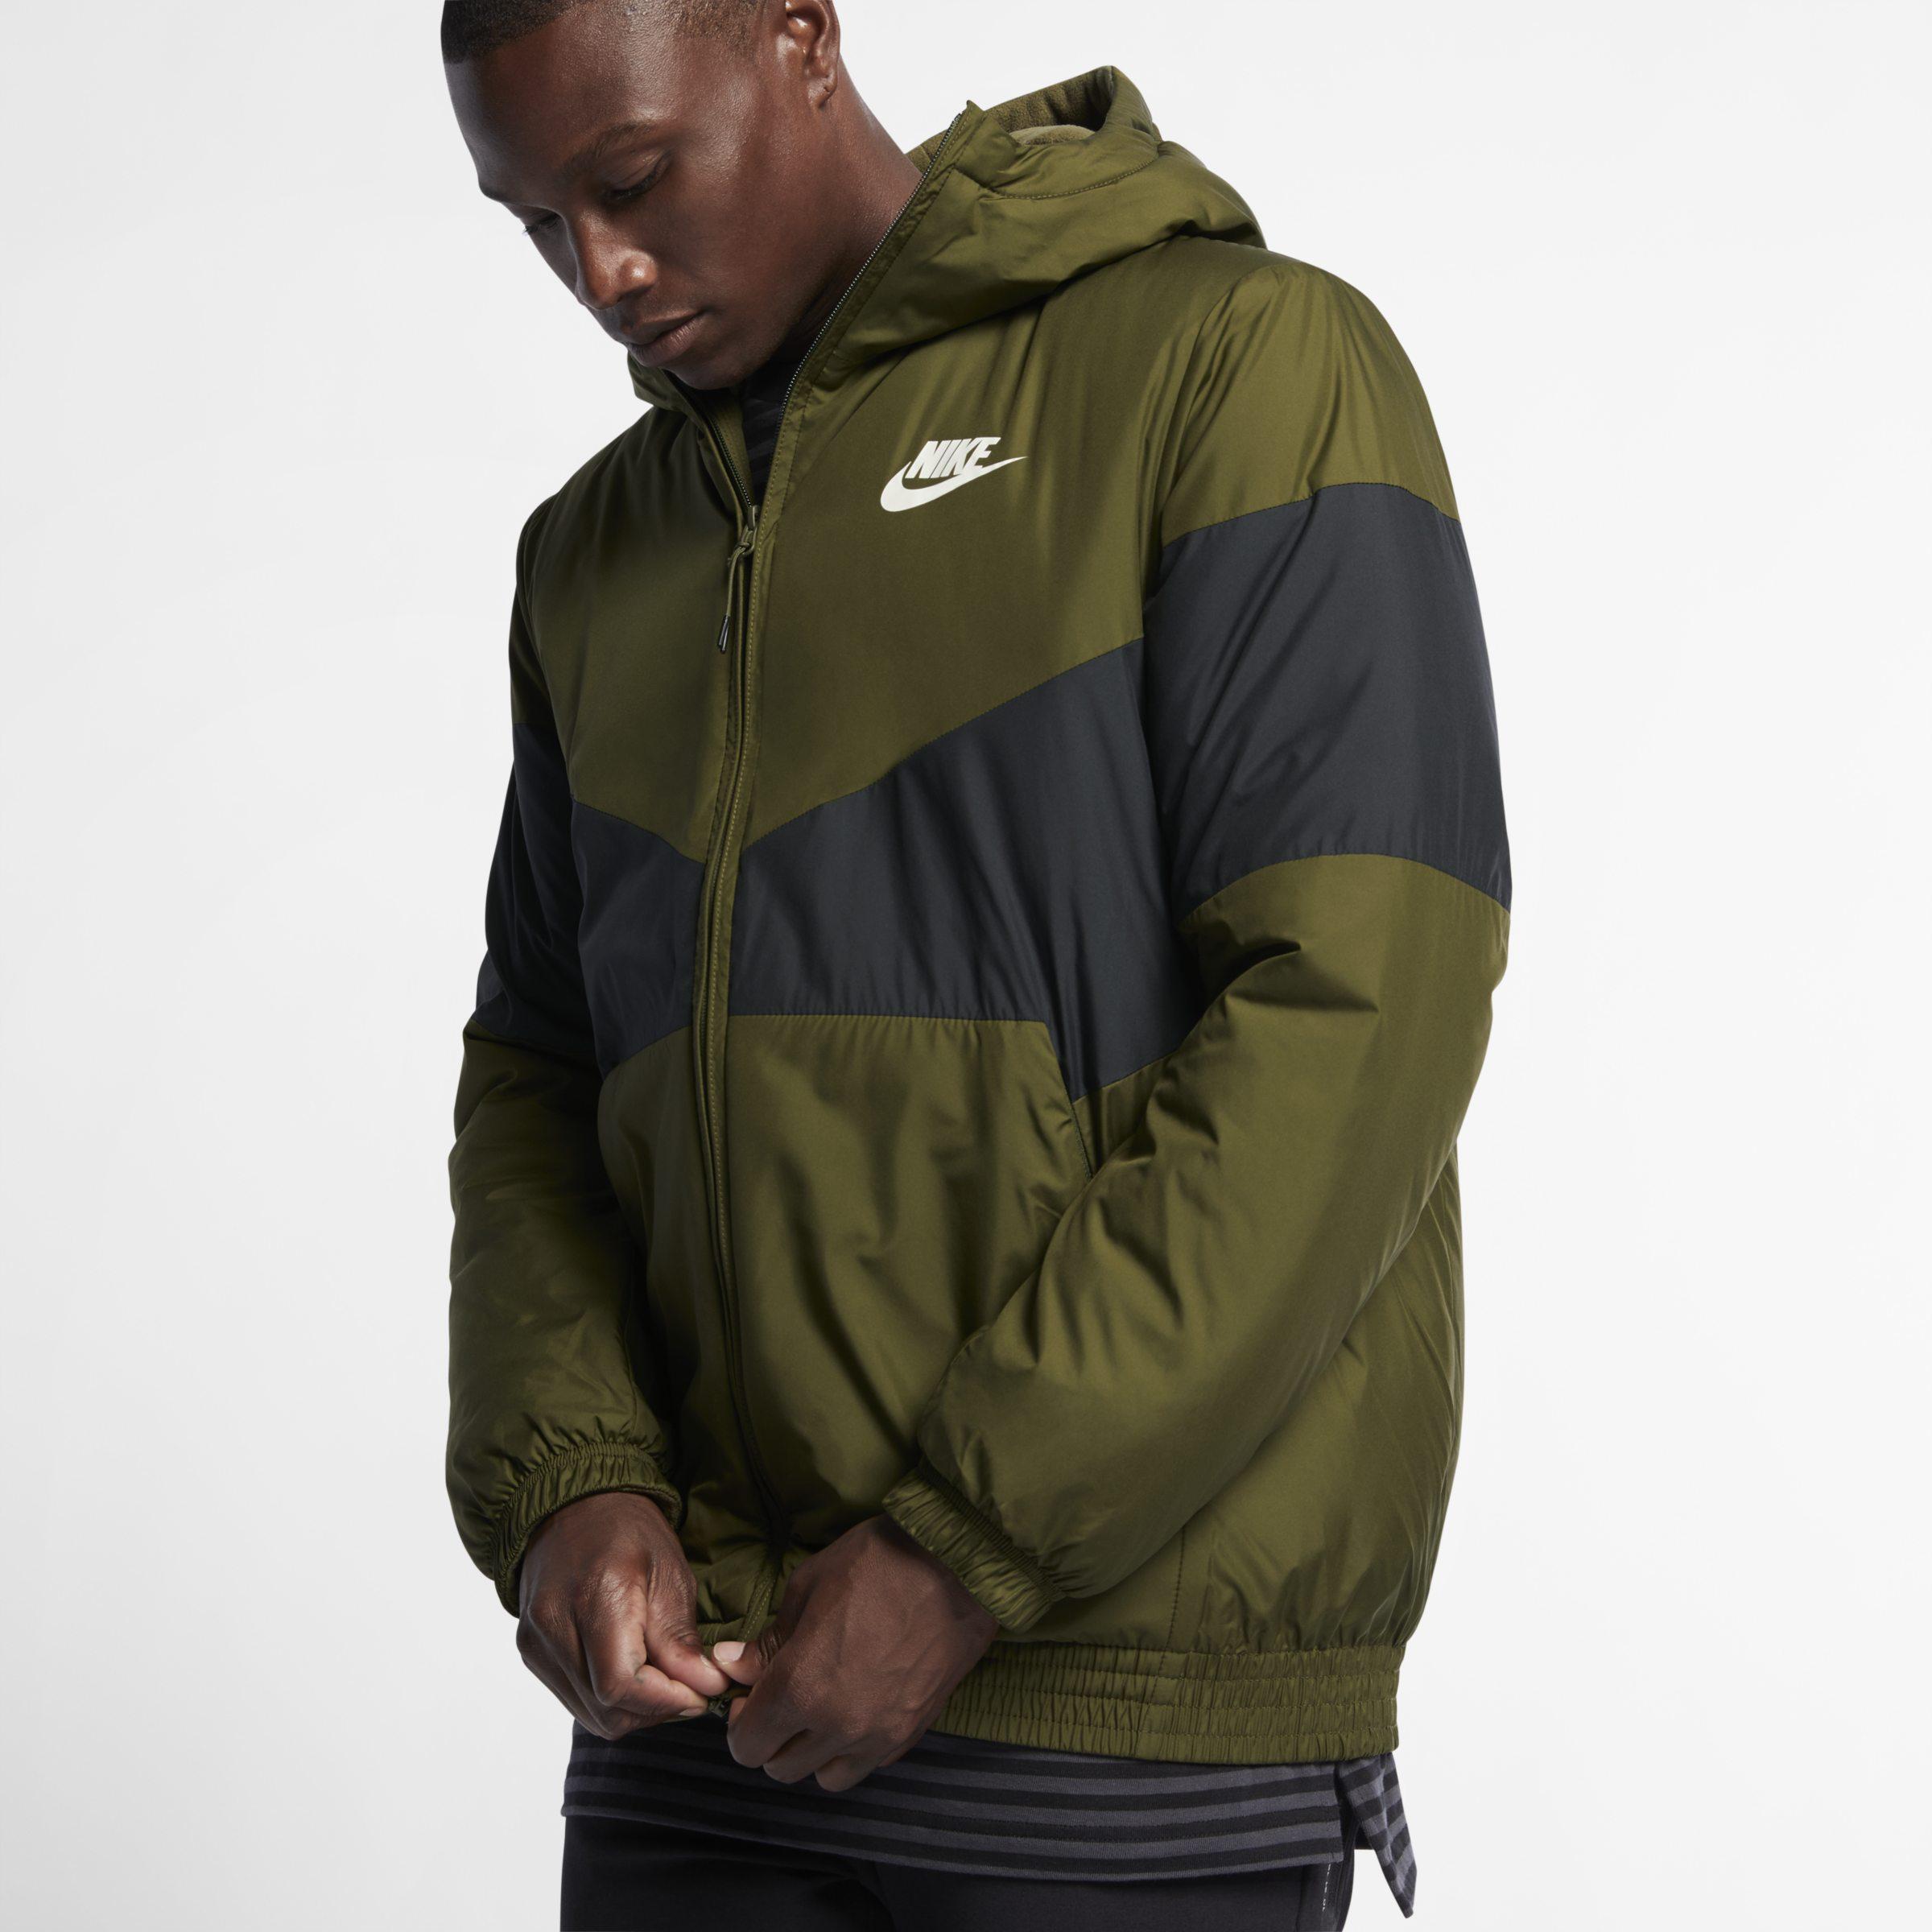 ee26d1bf90a65 Nike Sportswear Synthetic Fill Hooded Jacket in Green for Men - Lyst